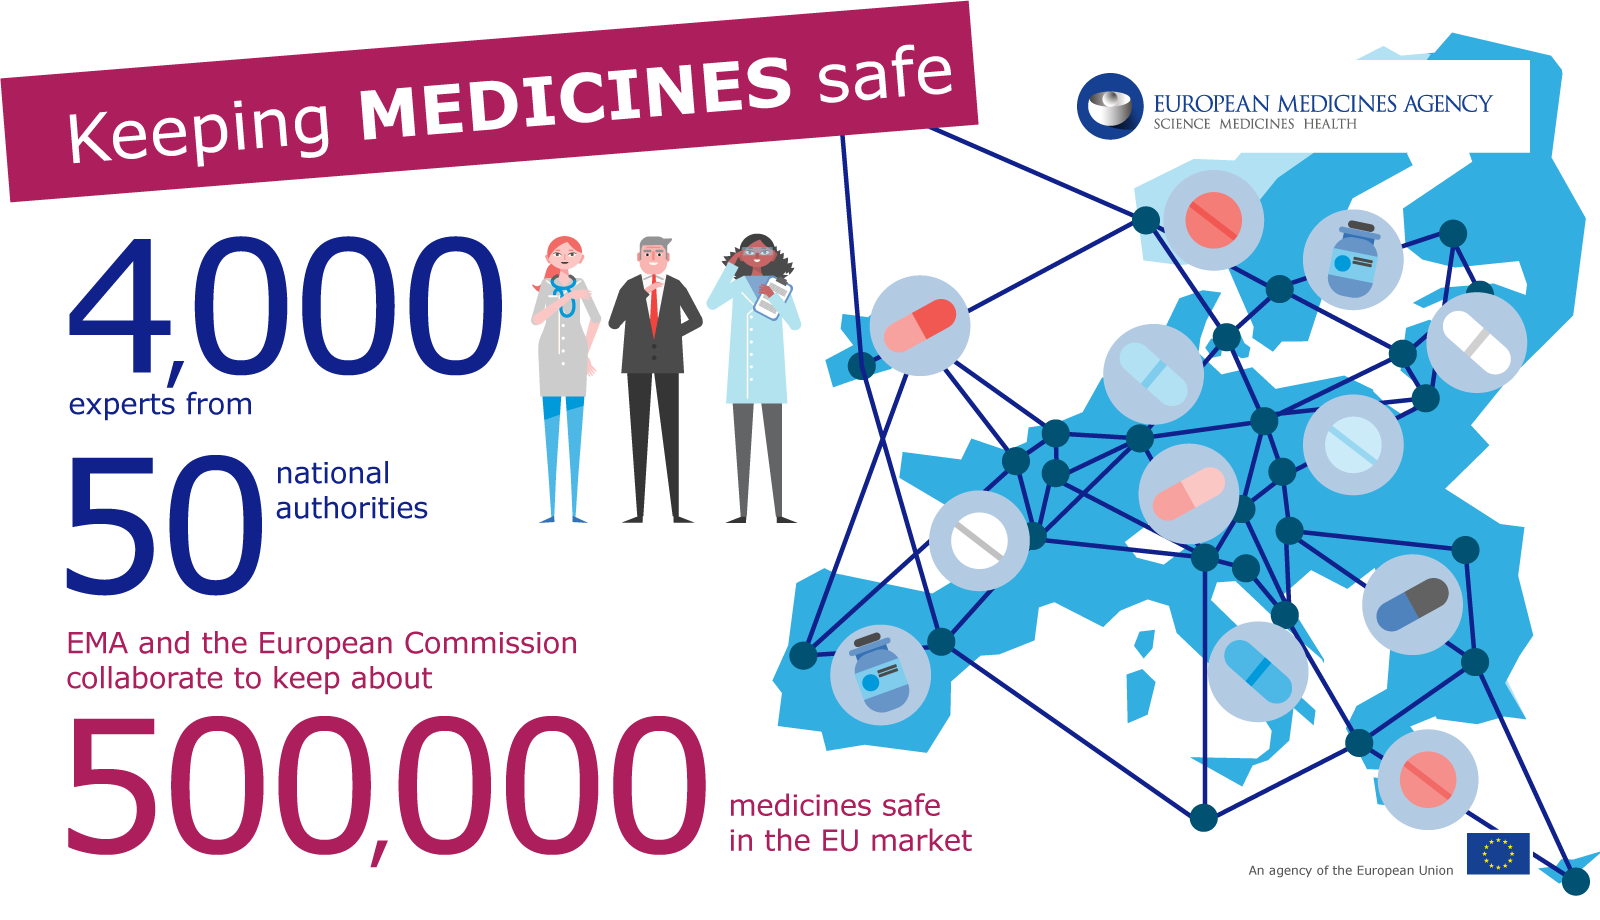 Keeping medicines safe